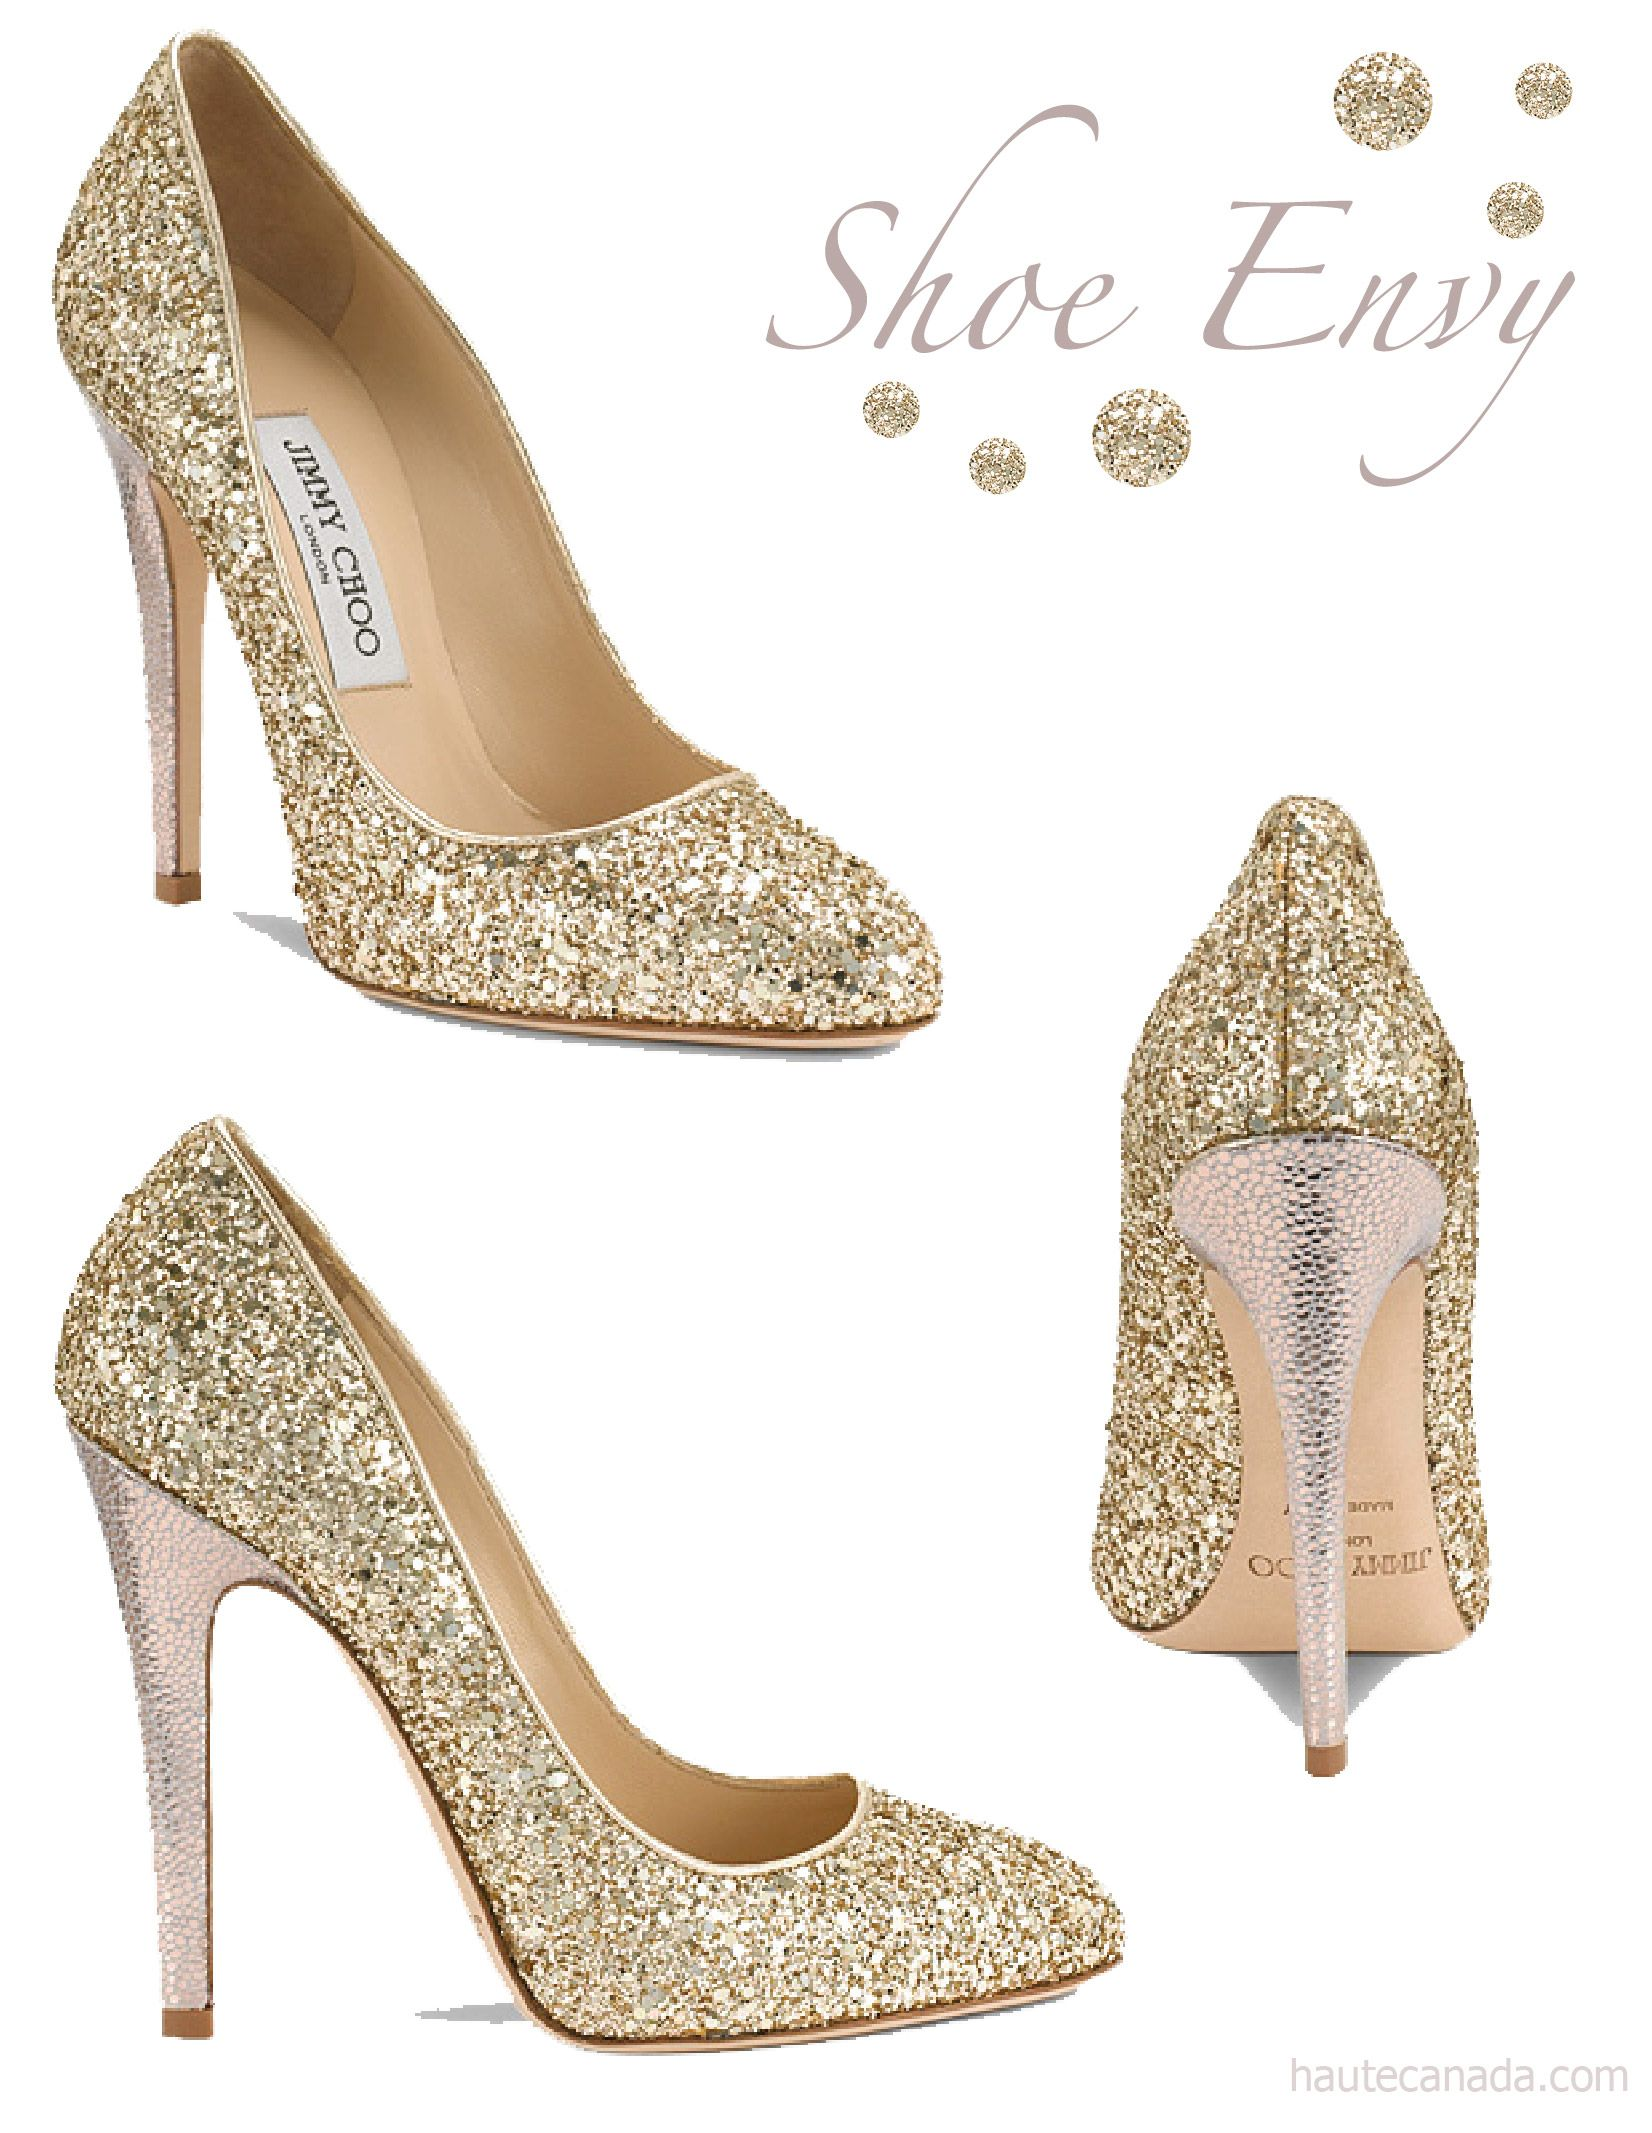 Shoe Envy: Jimmy Choo – Victoria, Gold Glitter Pumps | Haute by .